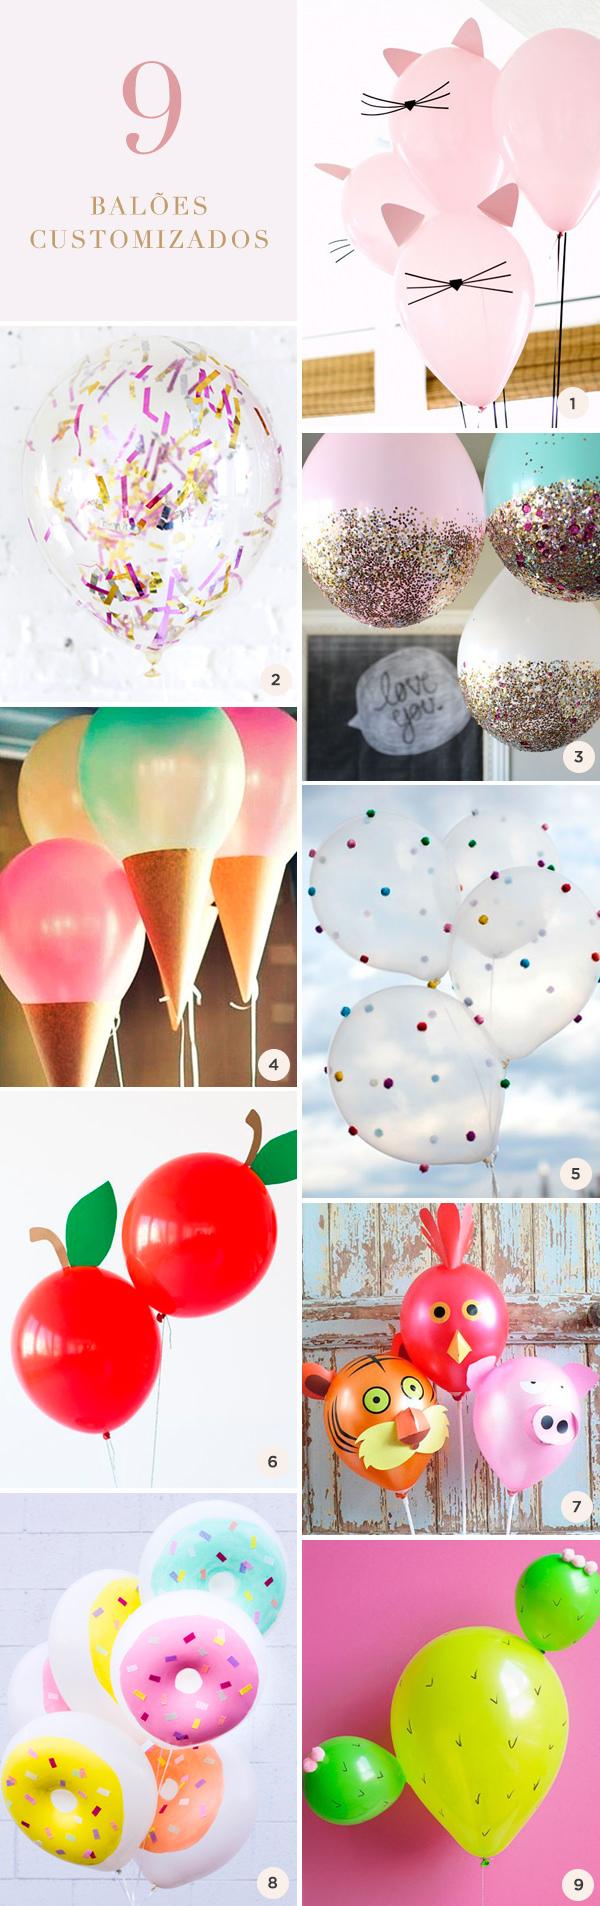 9 balões customizados para a festa infantil